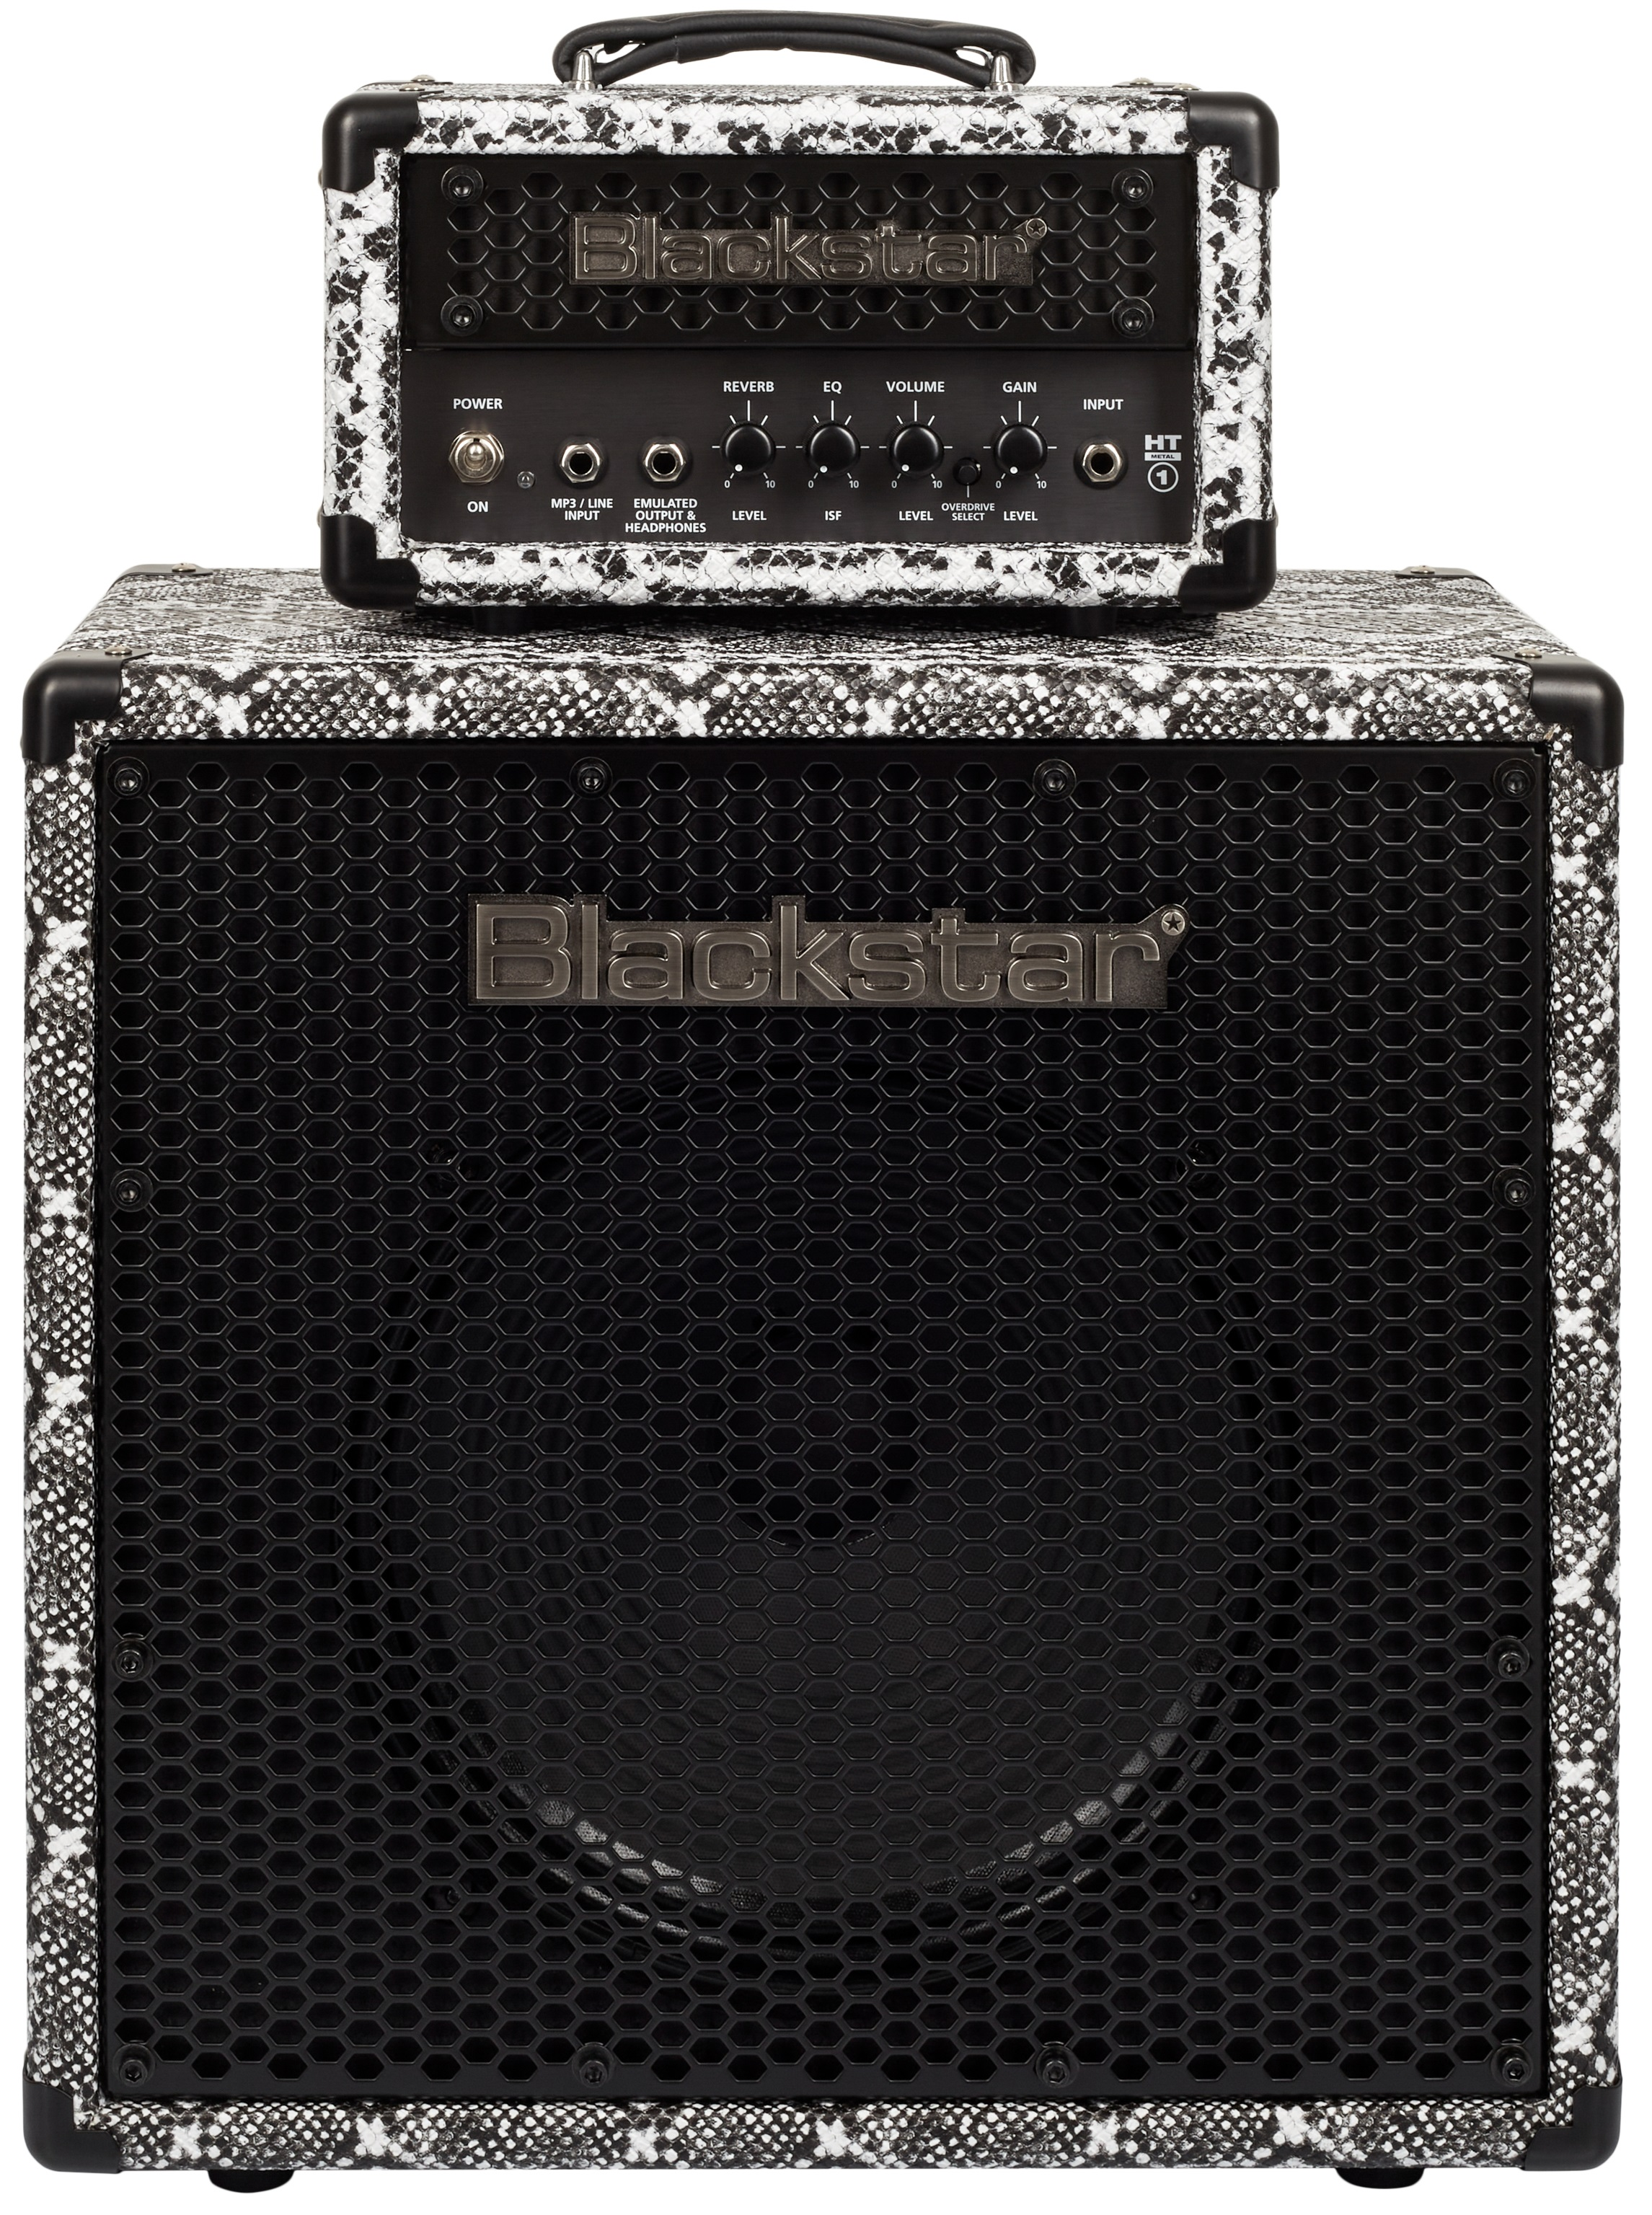 Blackstar HT-1RH Metal & HT-Metal 112 pack